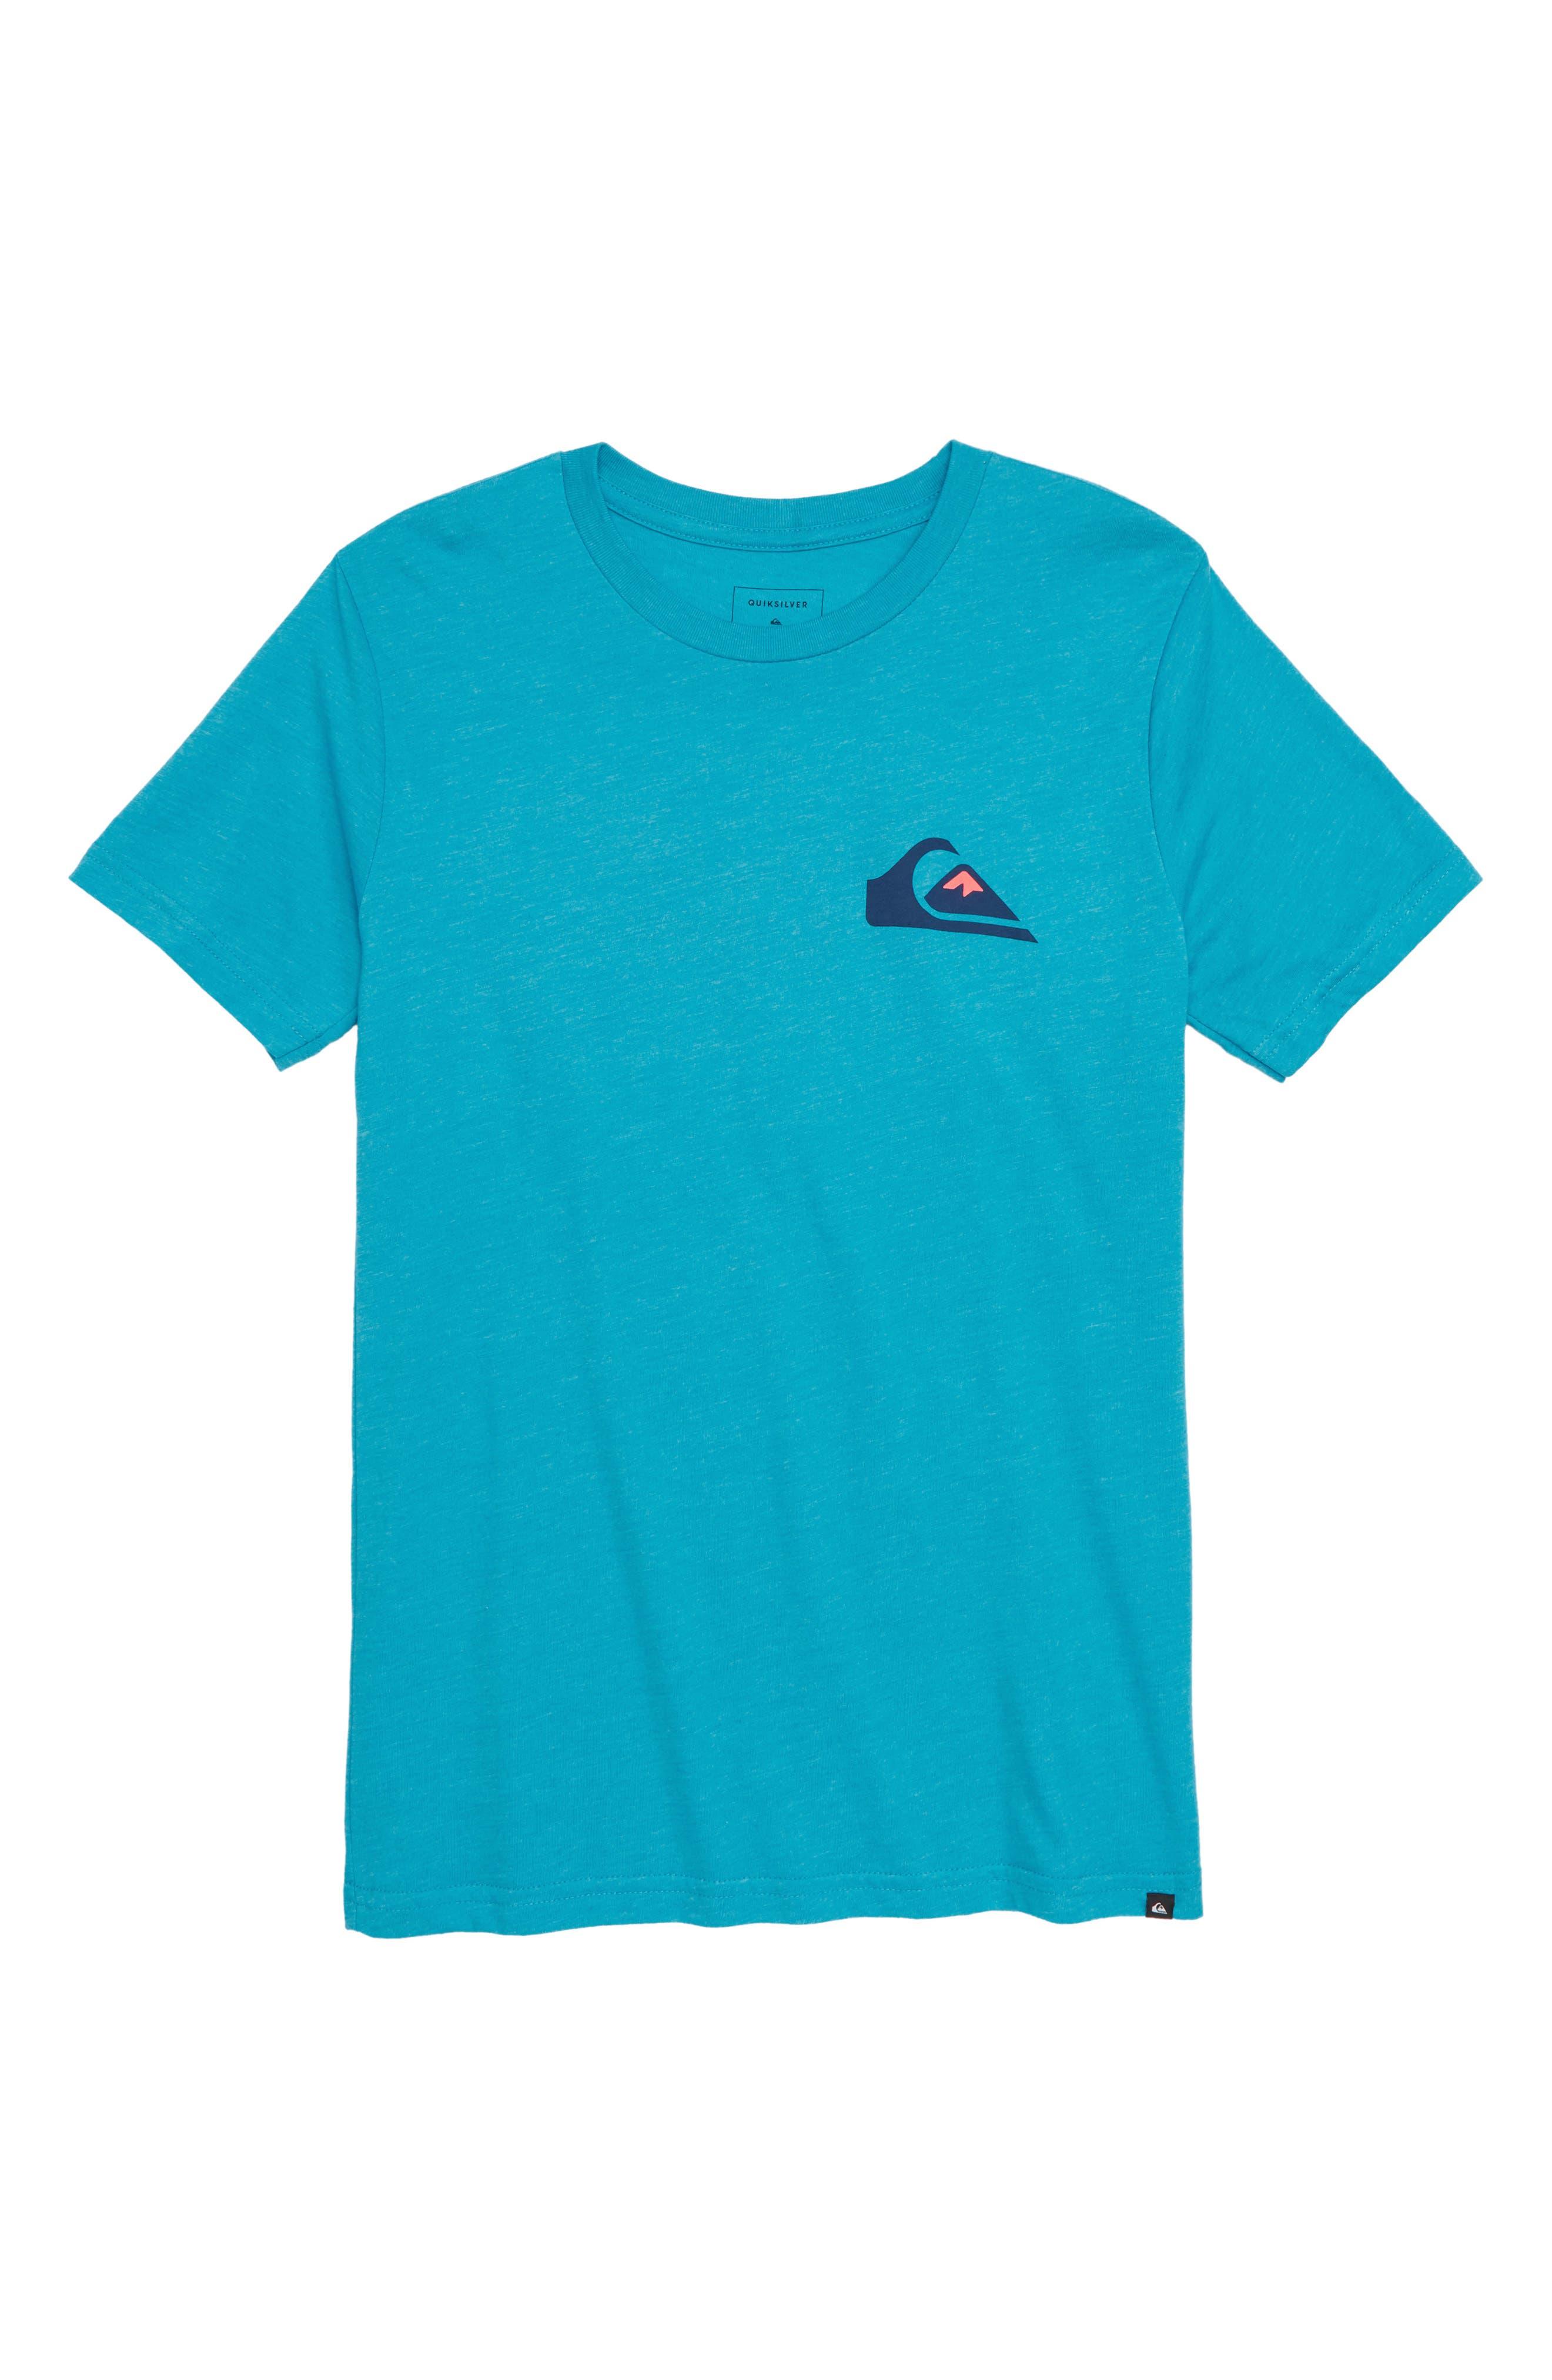 Vice Versa Graphic T-Shirt,                         Main,                         color, Typhoon Heather